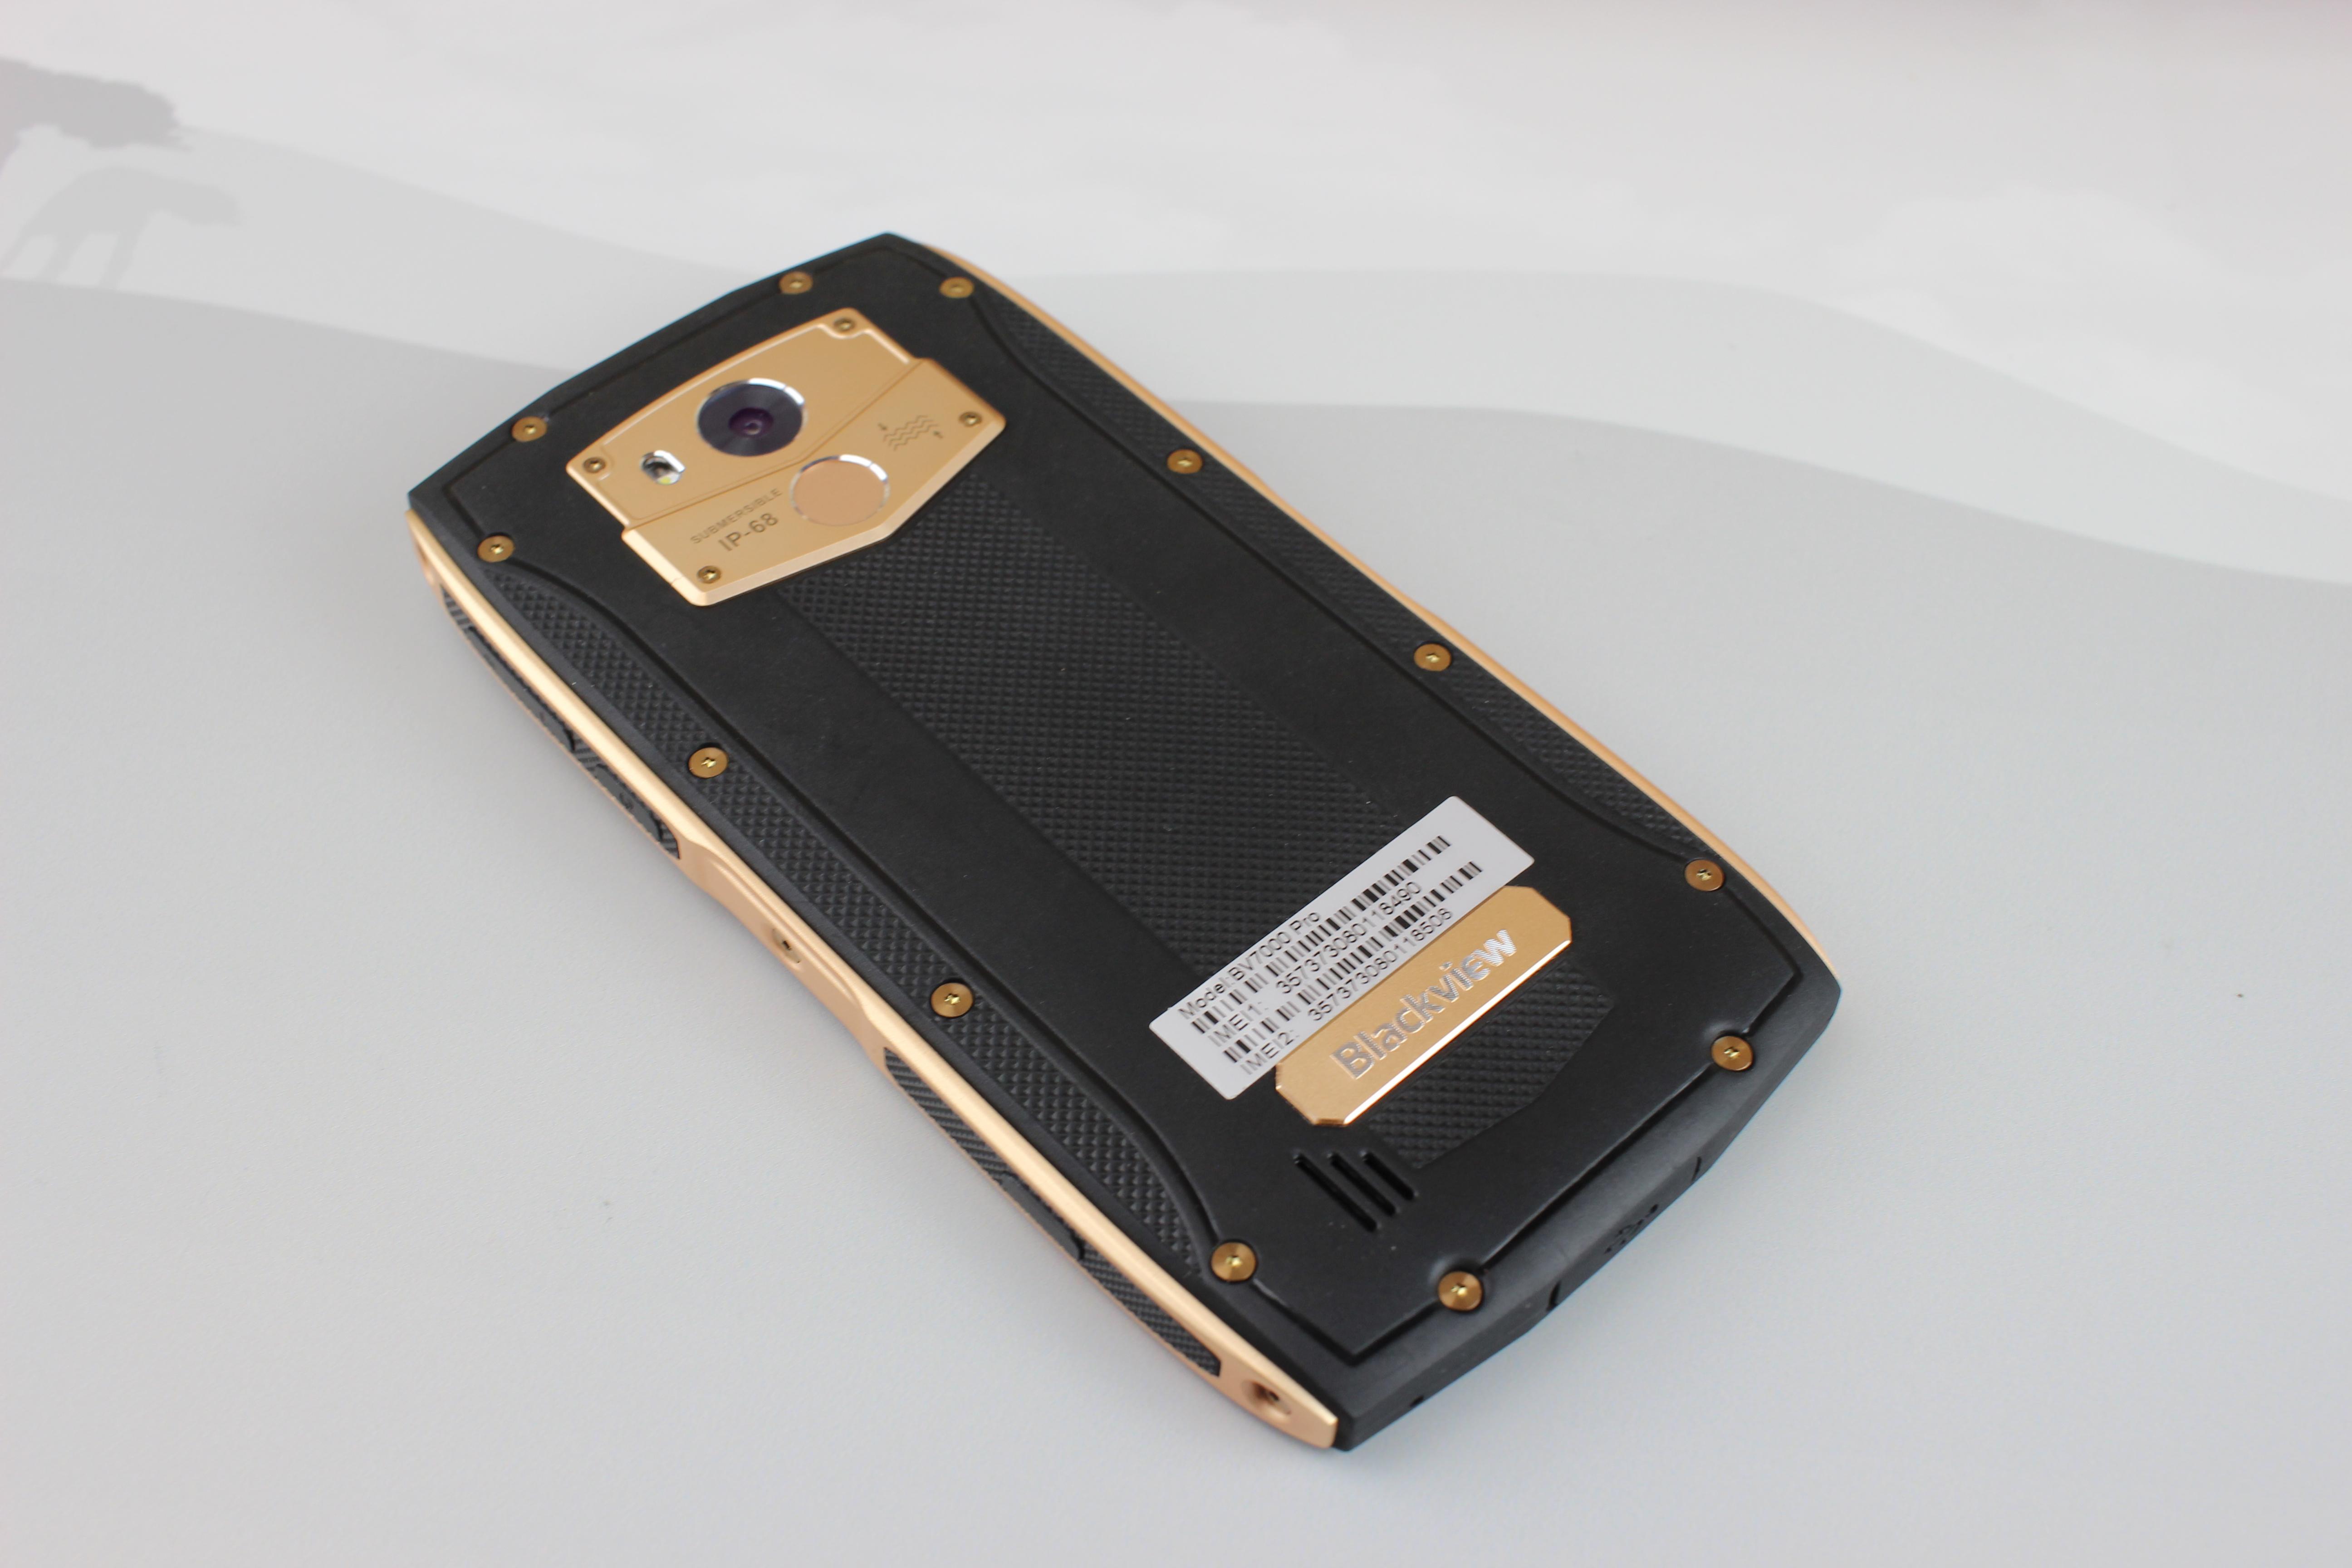 Blackview bv7000 pro im test: outdoor smartphone test mit videoreview